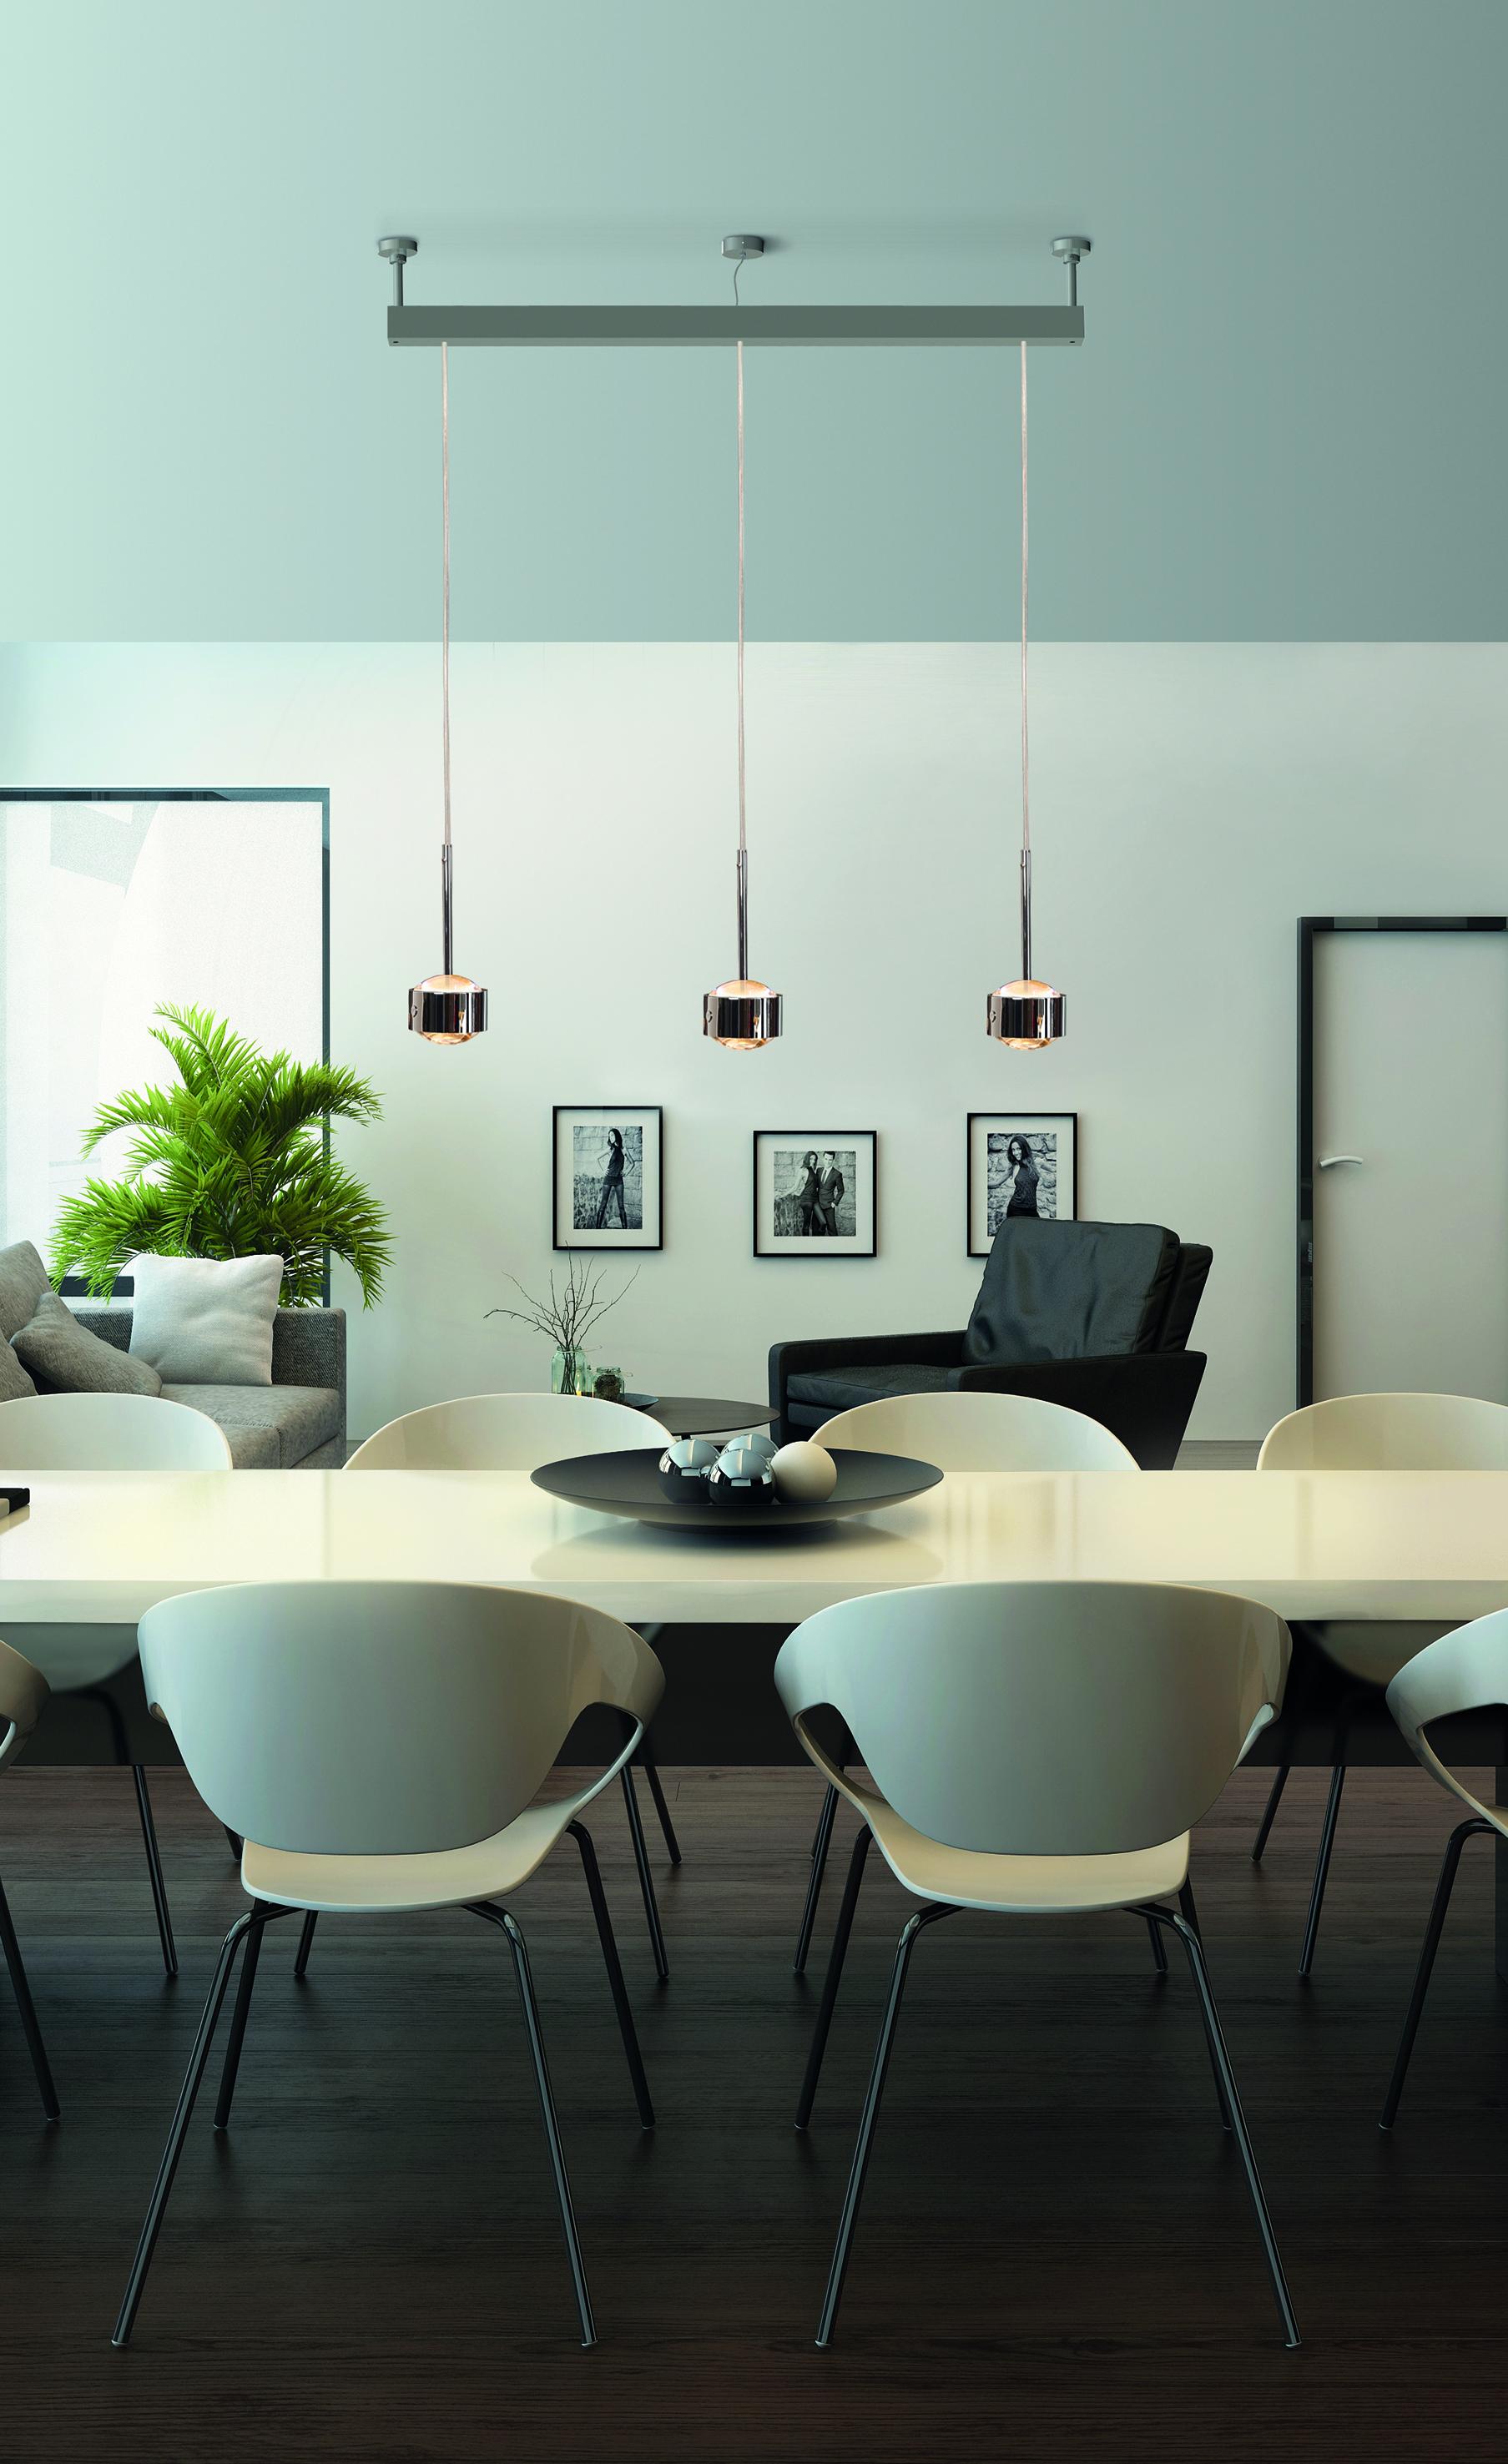 puk choice drop led top light. Black Bedroom Furniture Sets. Home Design Ideas